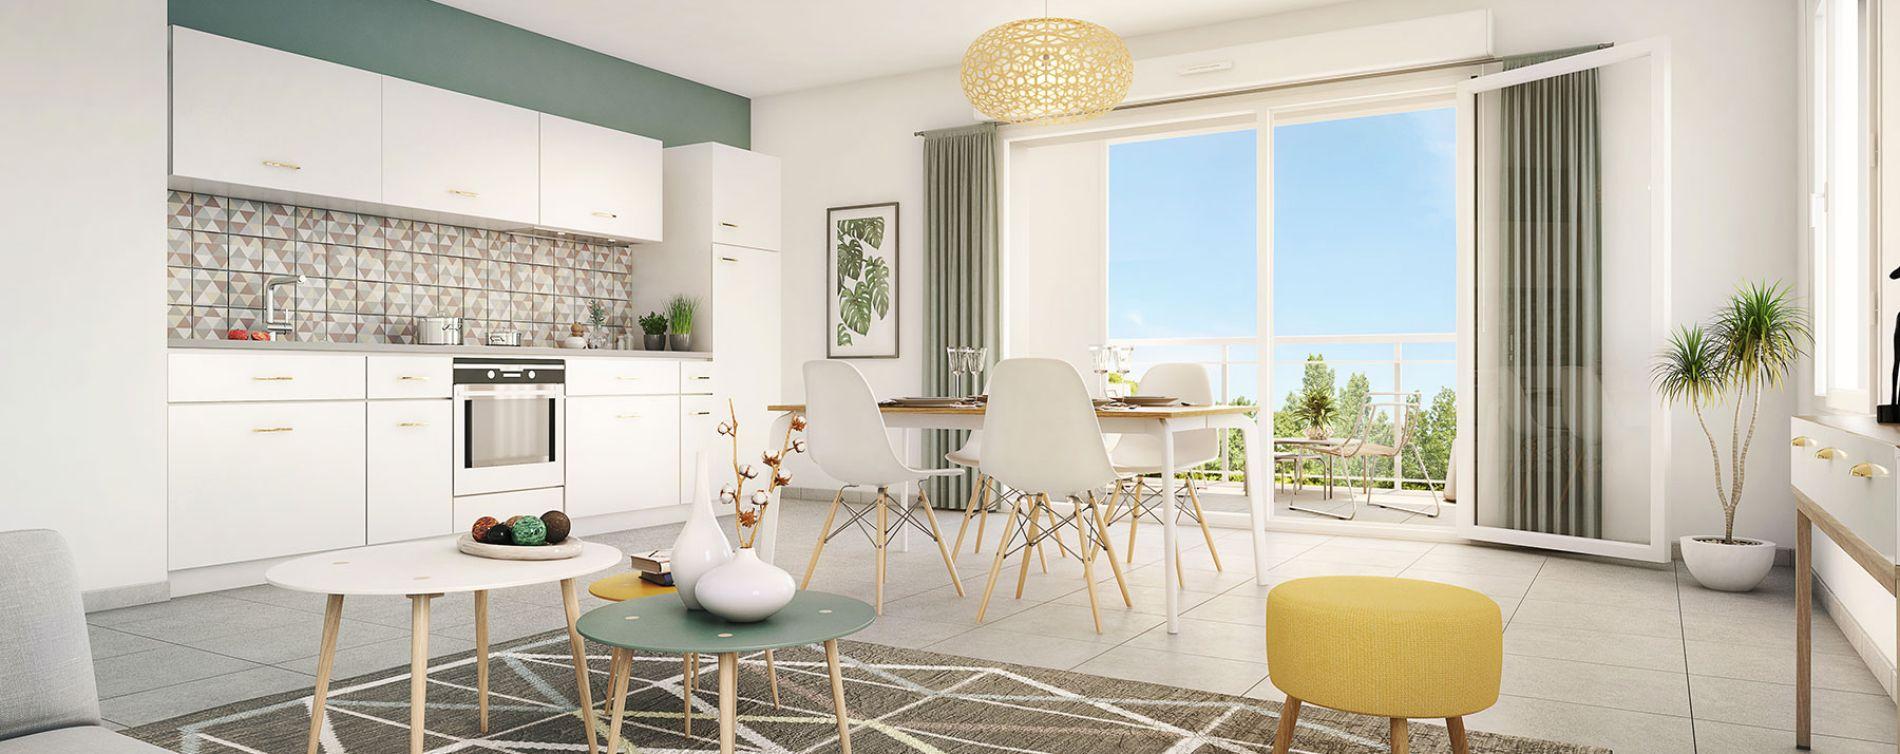 Grigny : programme immobilier neuve « Pastel » (3)